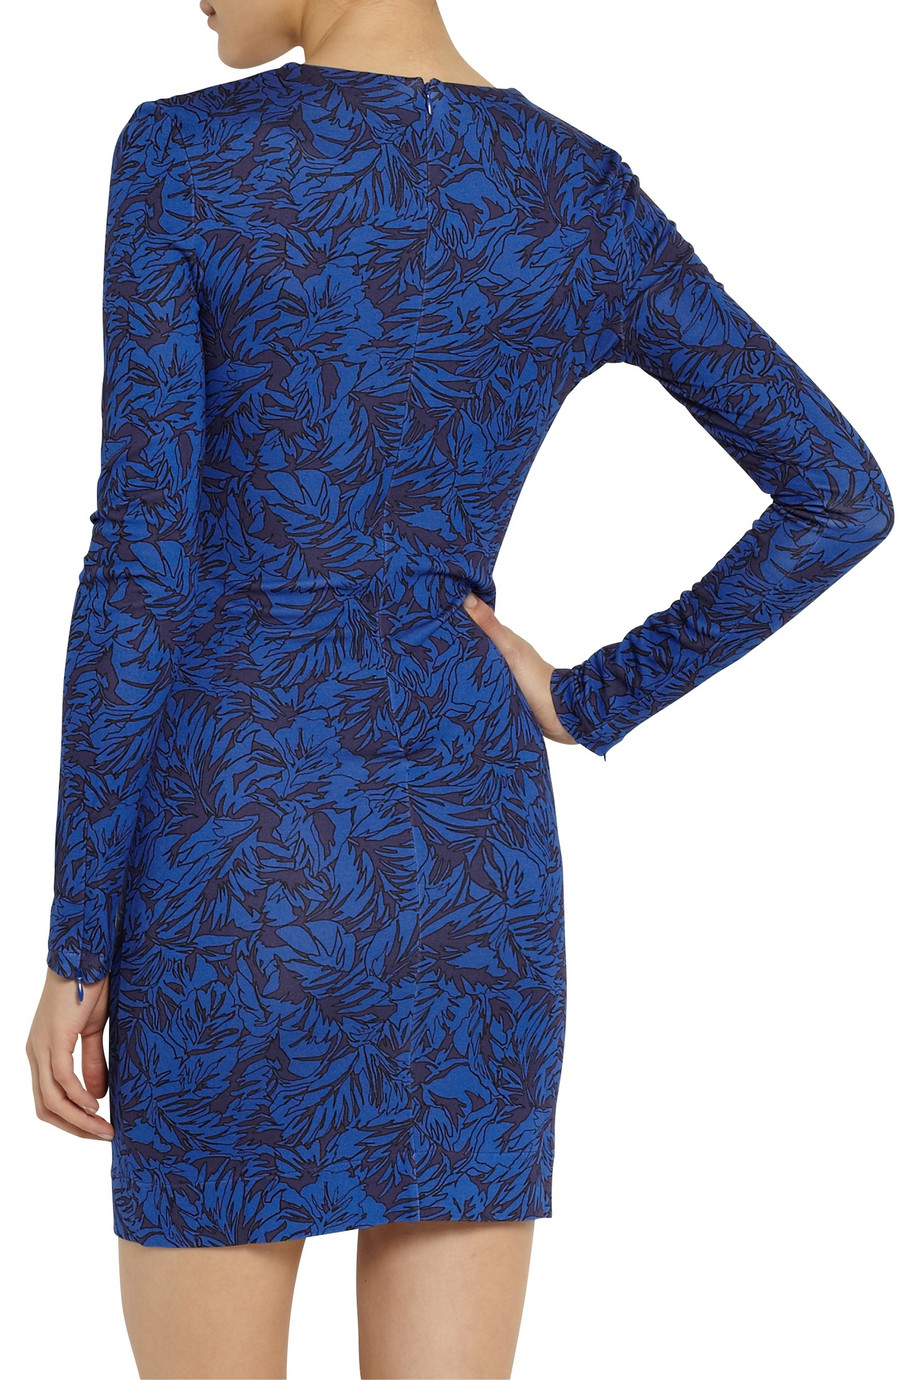 Matthew Williamson Printed Stretch-Jersey Mini Dress in Bright Blue (Blue)